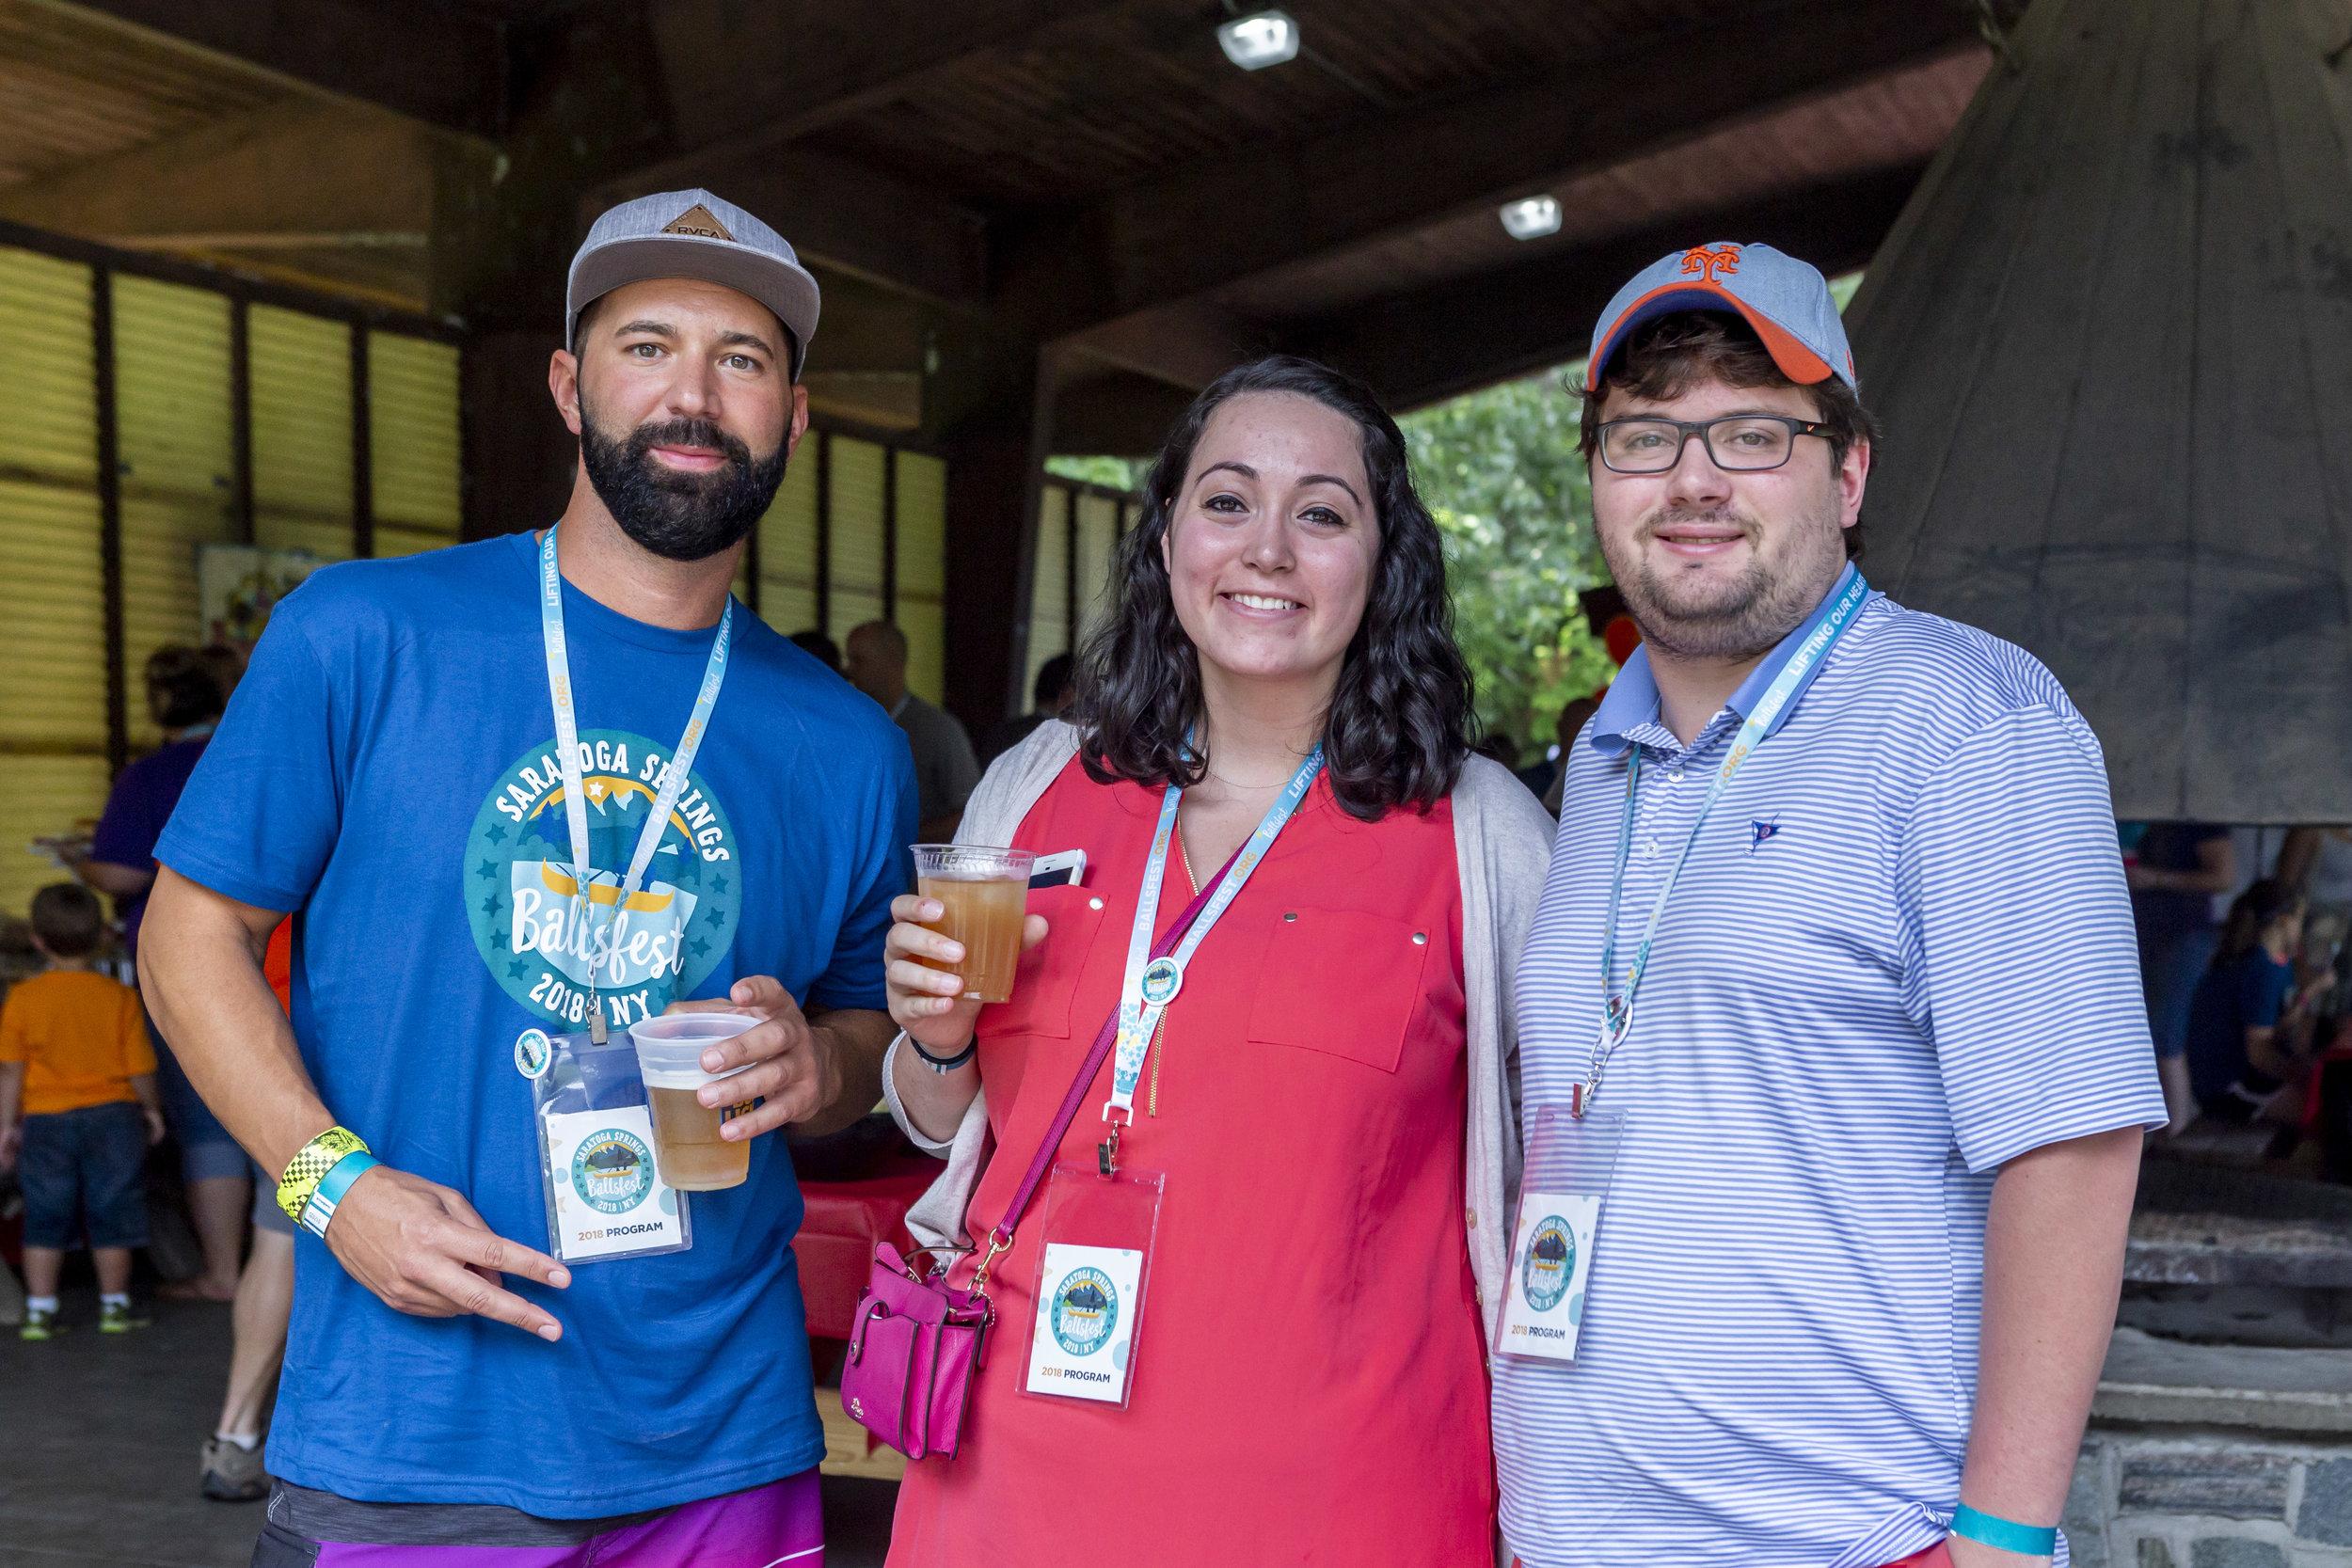 (2018.07.14) Ballsfest Saratoga Spa State Park-3596.jpg